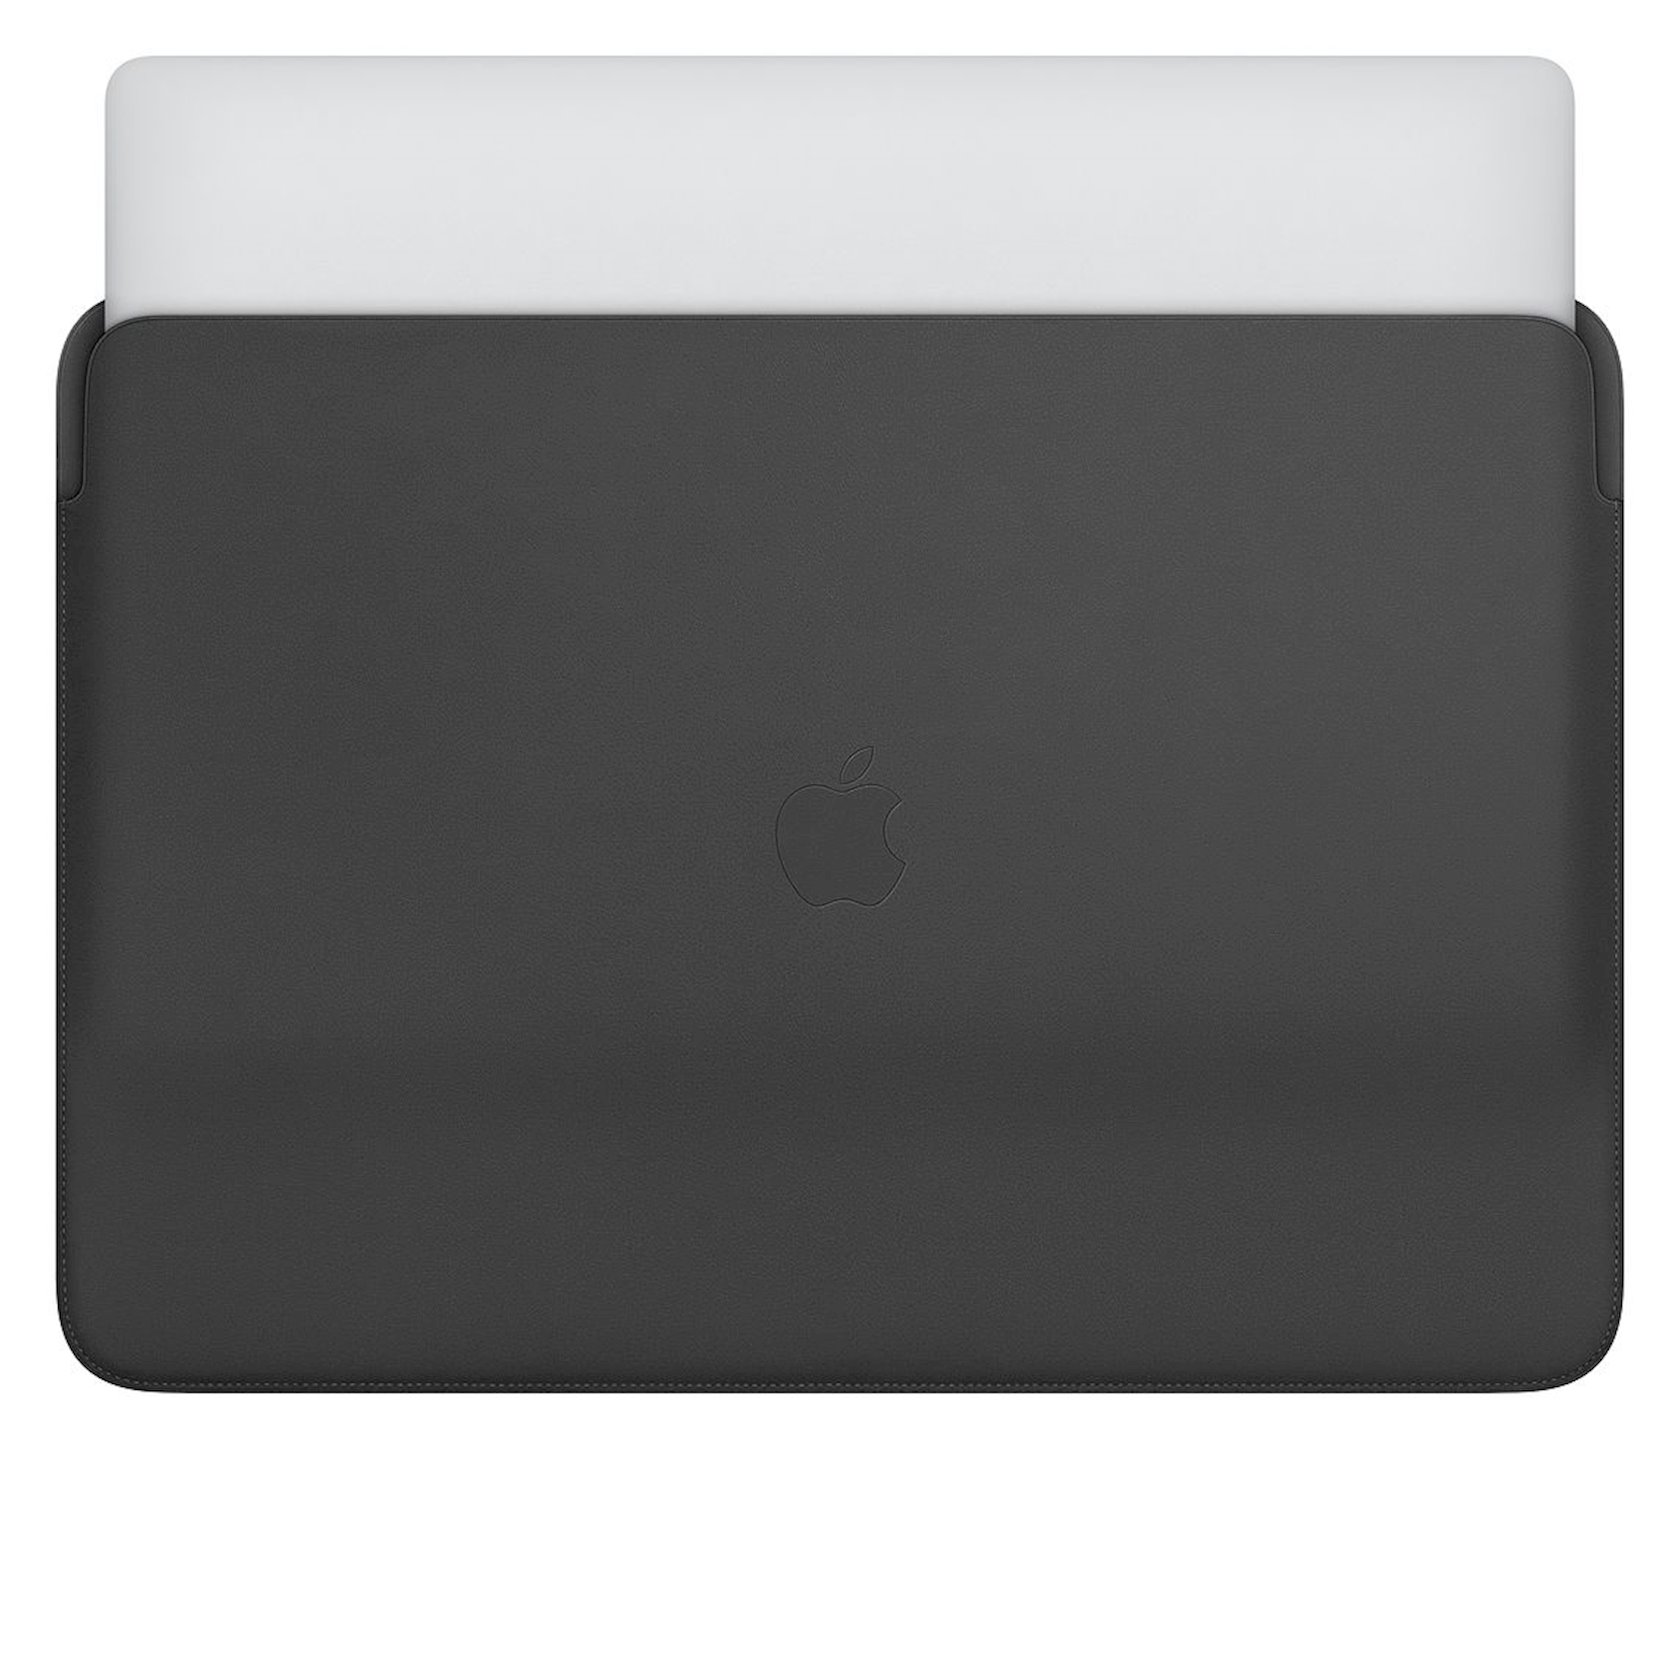 Noutbuk üçün çexol Apple Leather Sleeve for 16-inch MacBook Pro Black